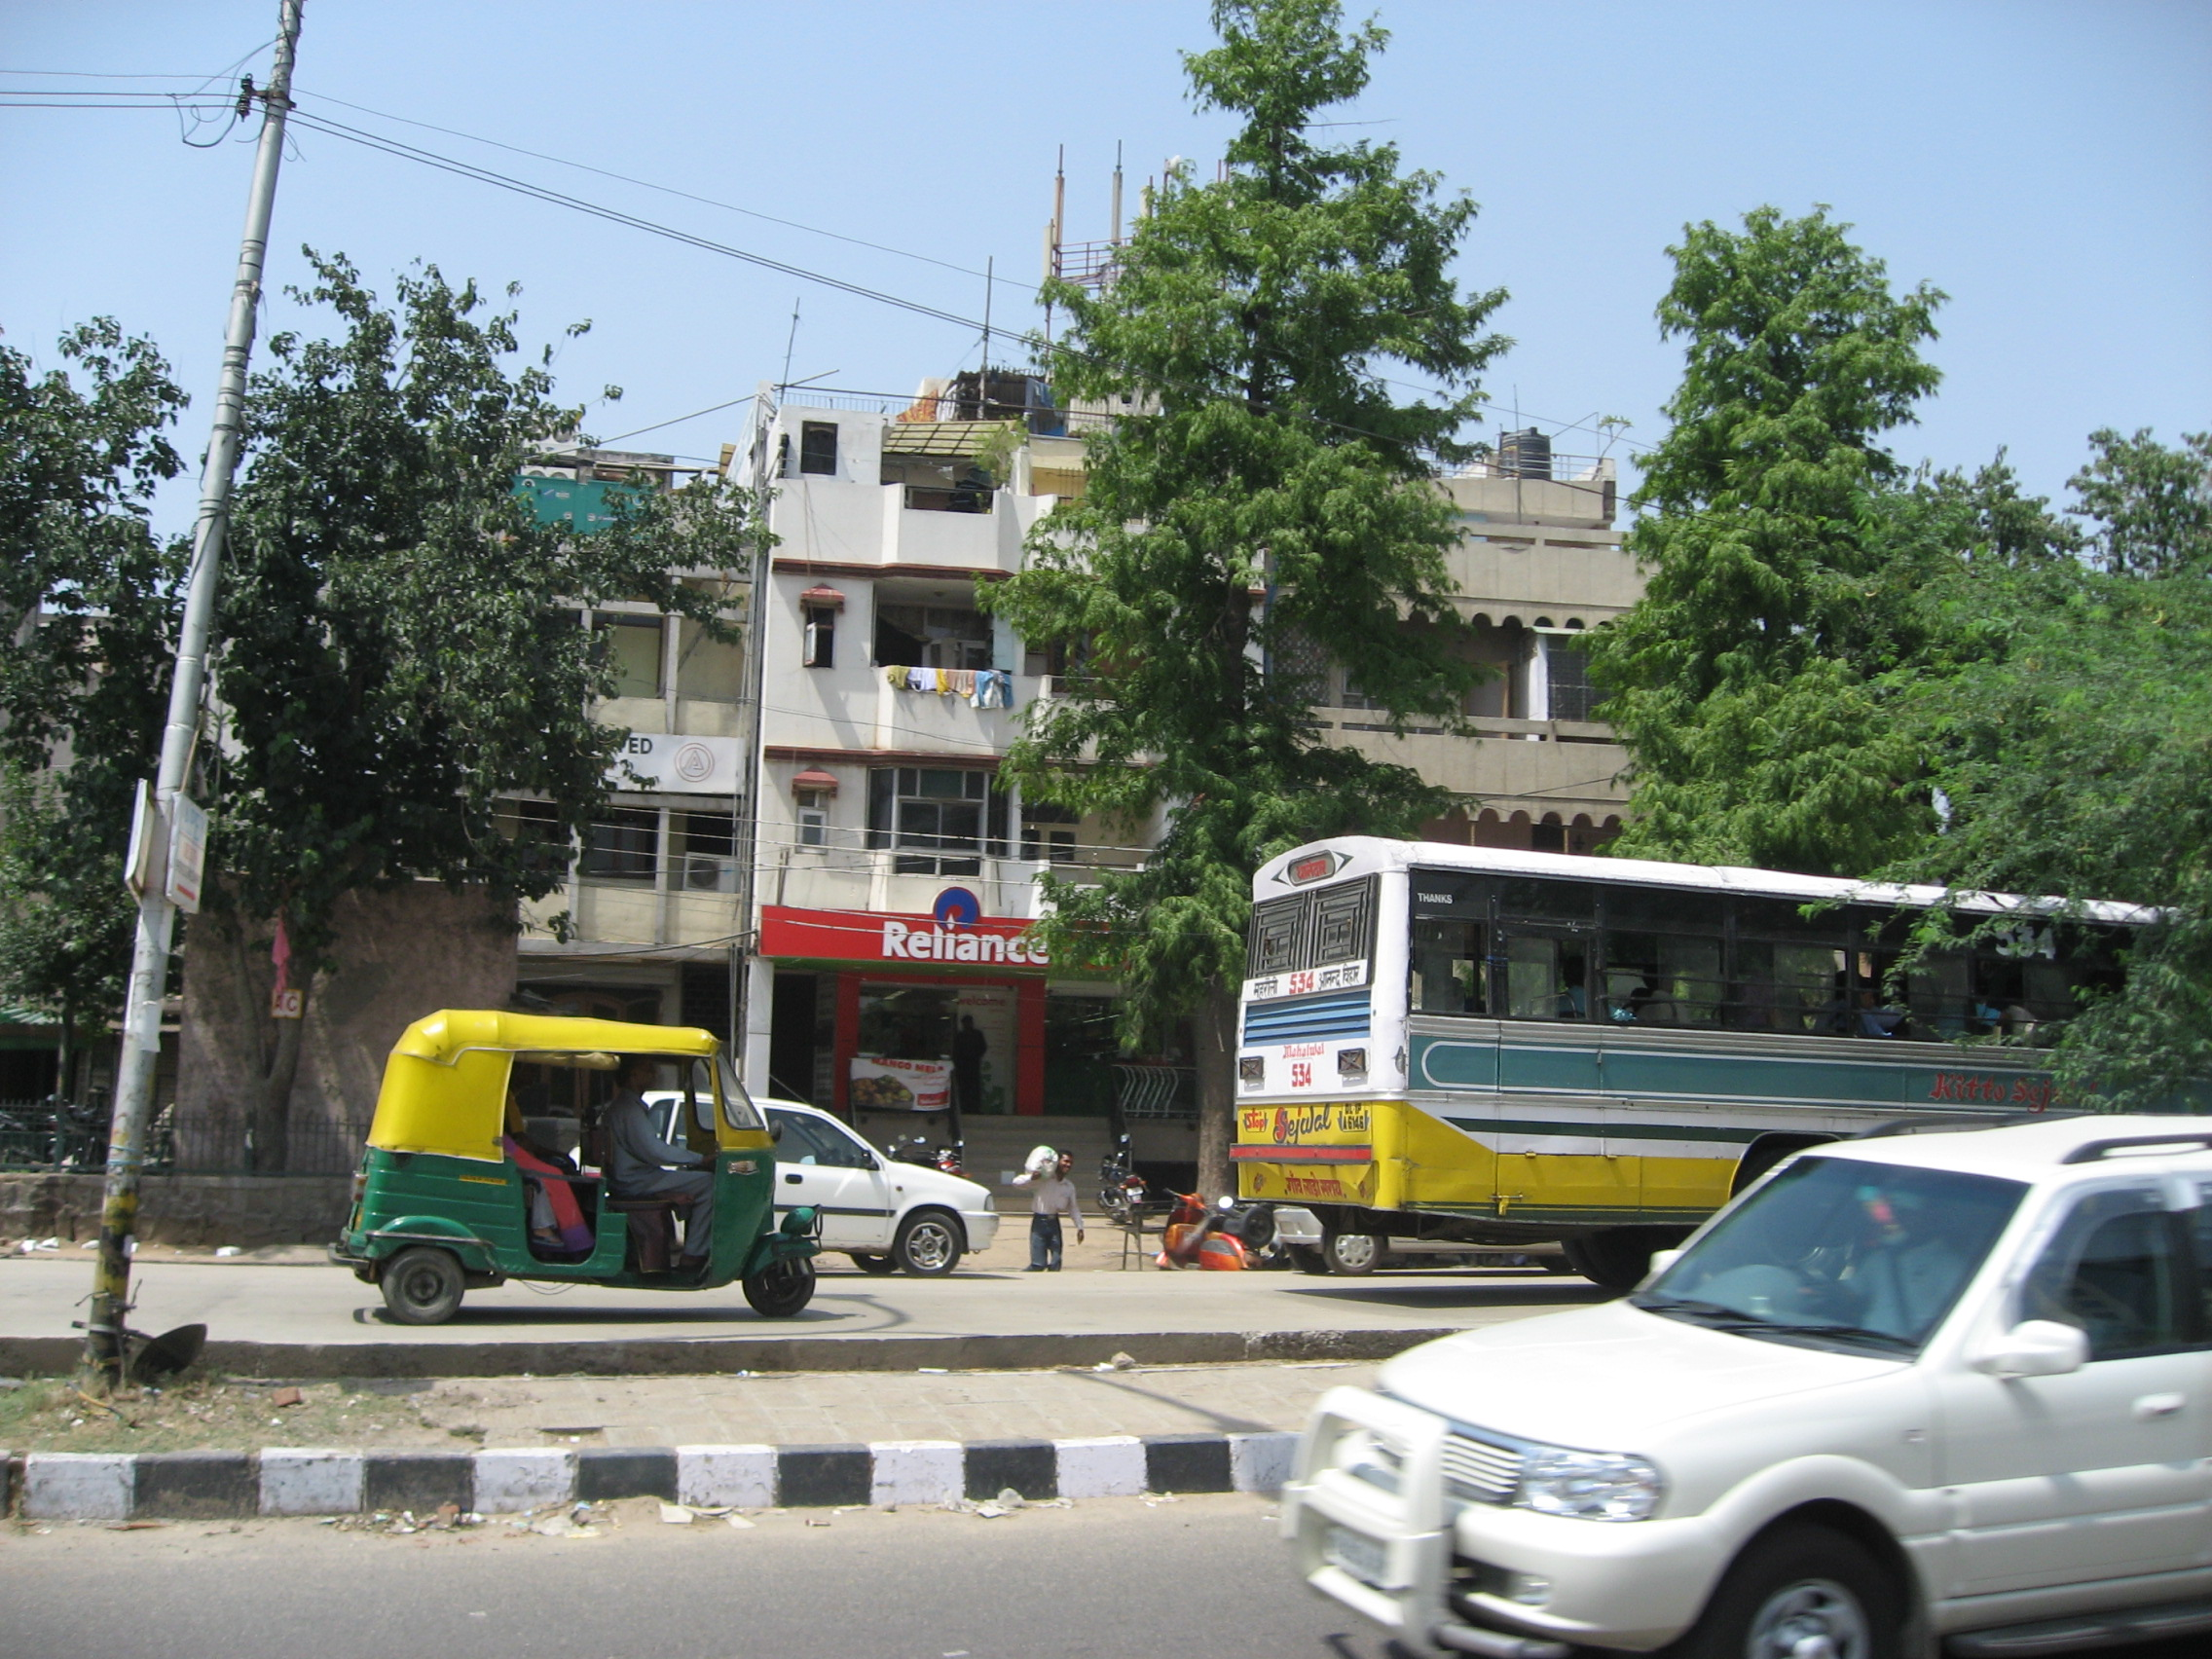 a RelianceFresh store in south Delhi